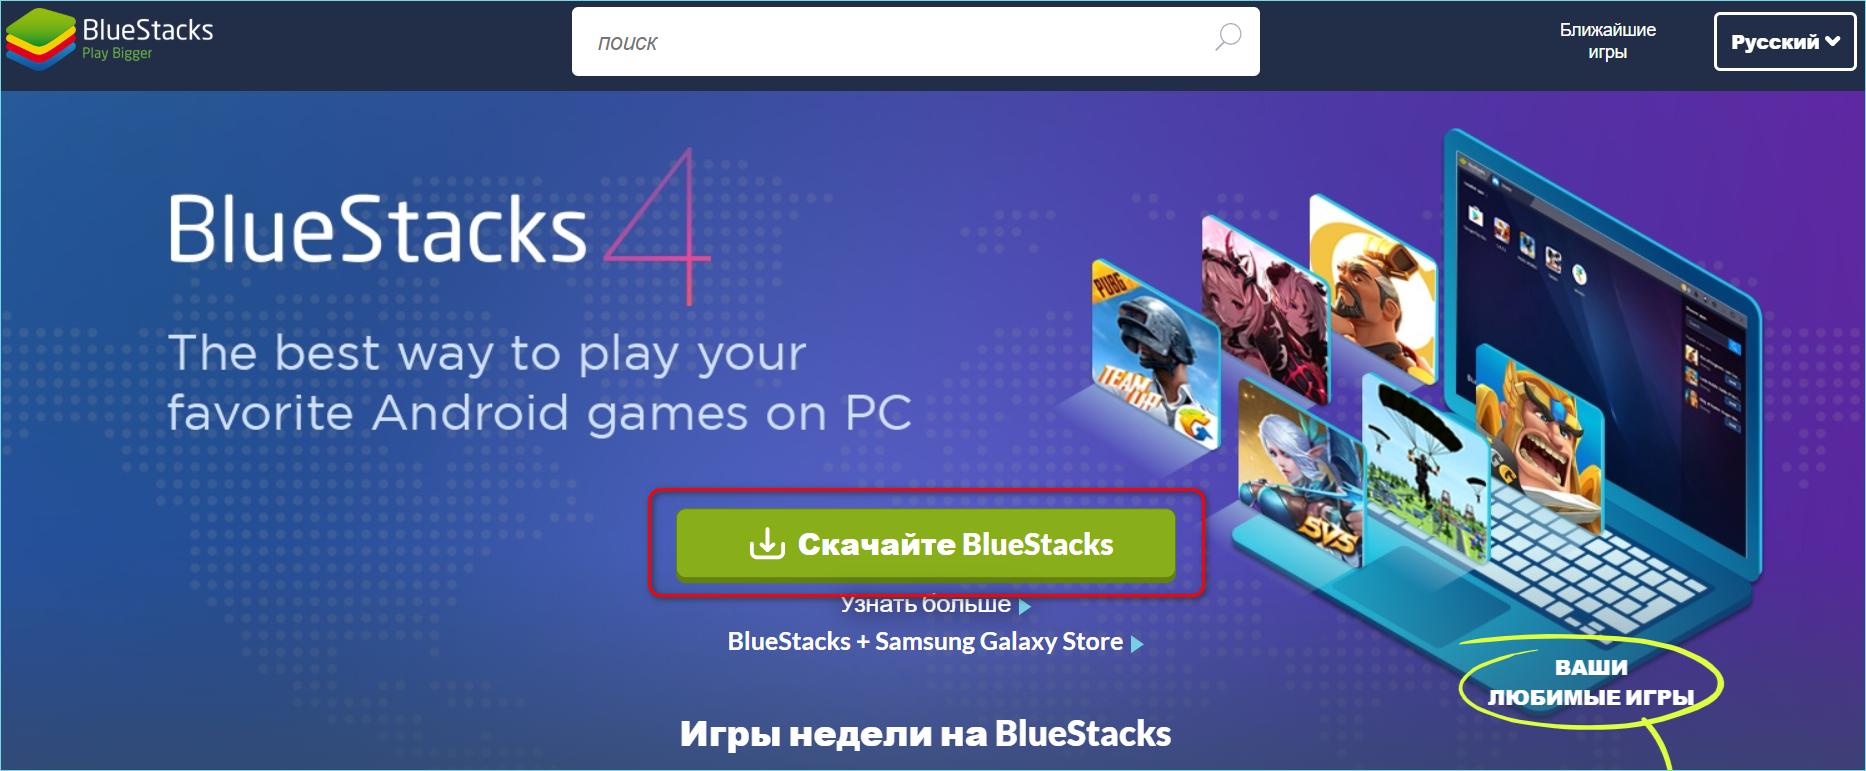 Skachivanie-Bluestacks.png